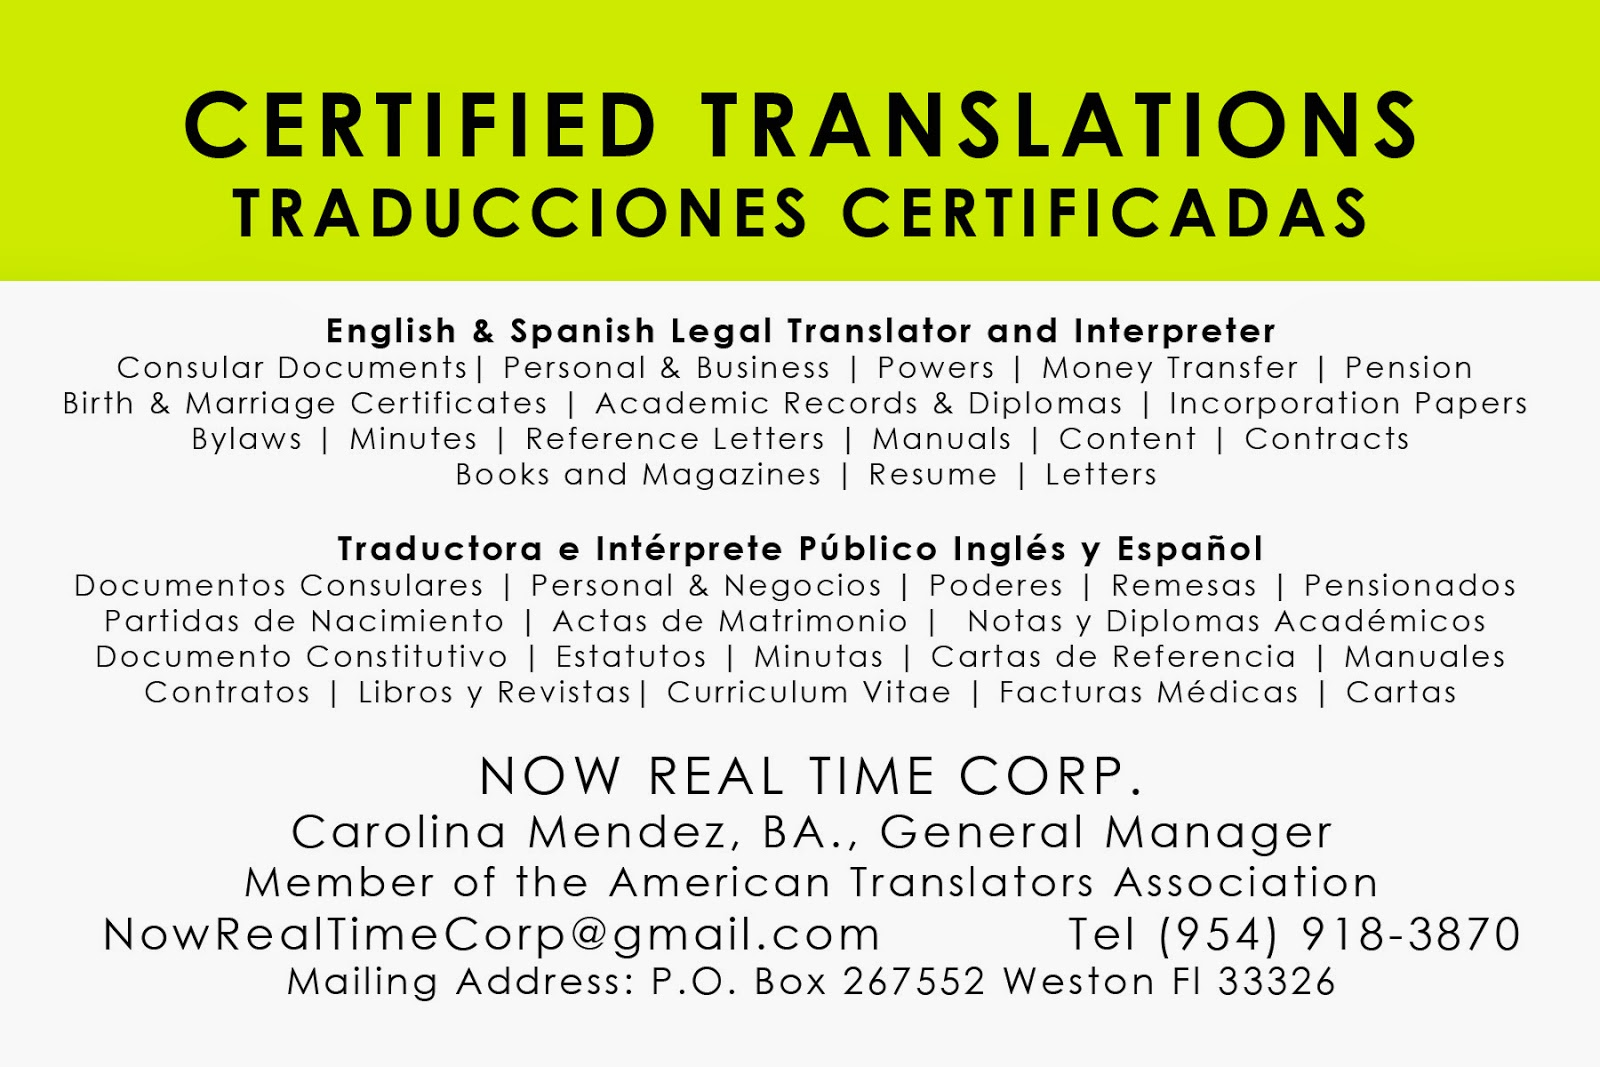 Hispanic Translations: English and Spanish: 2014